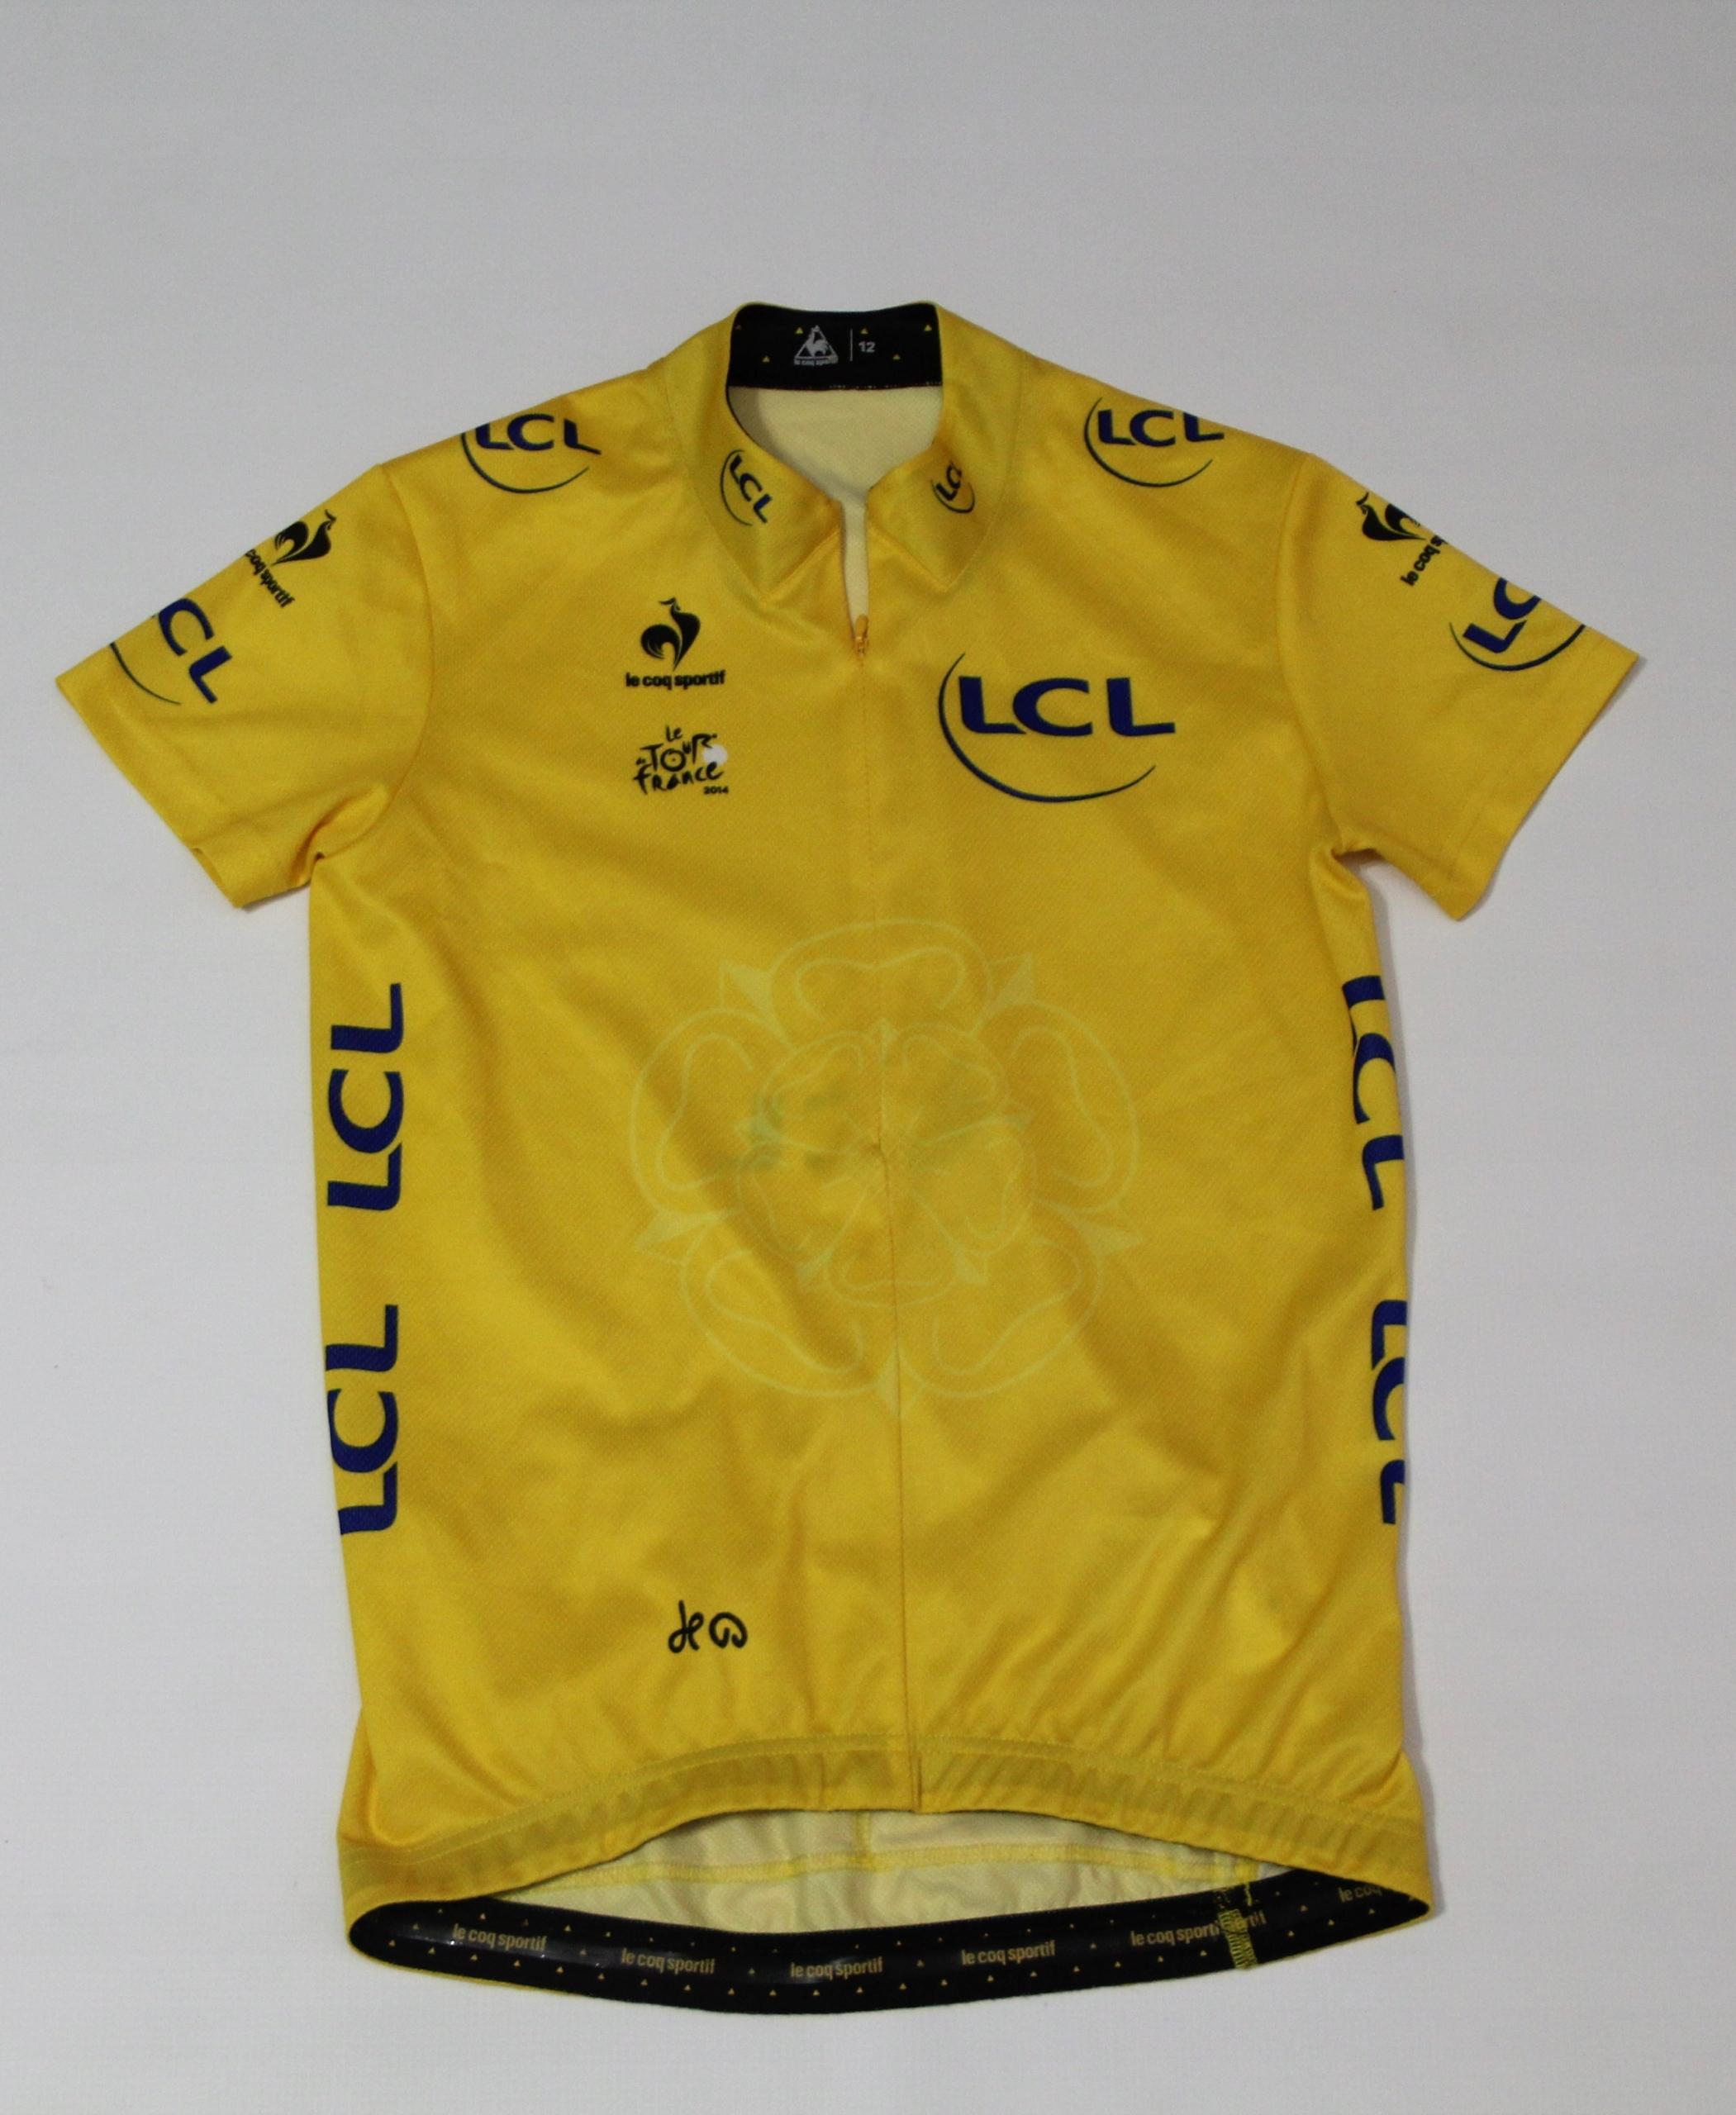 Męska Koszulka Lee Coq Sportif Le Tour France 2014